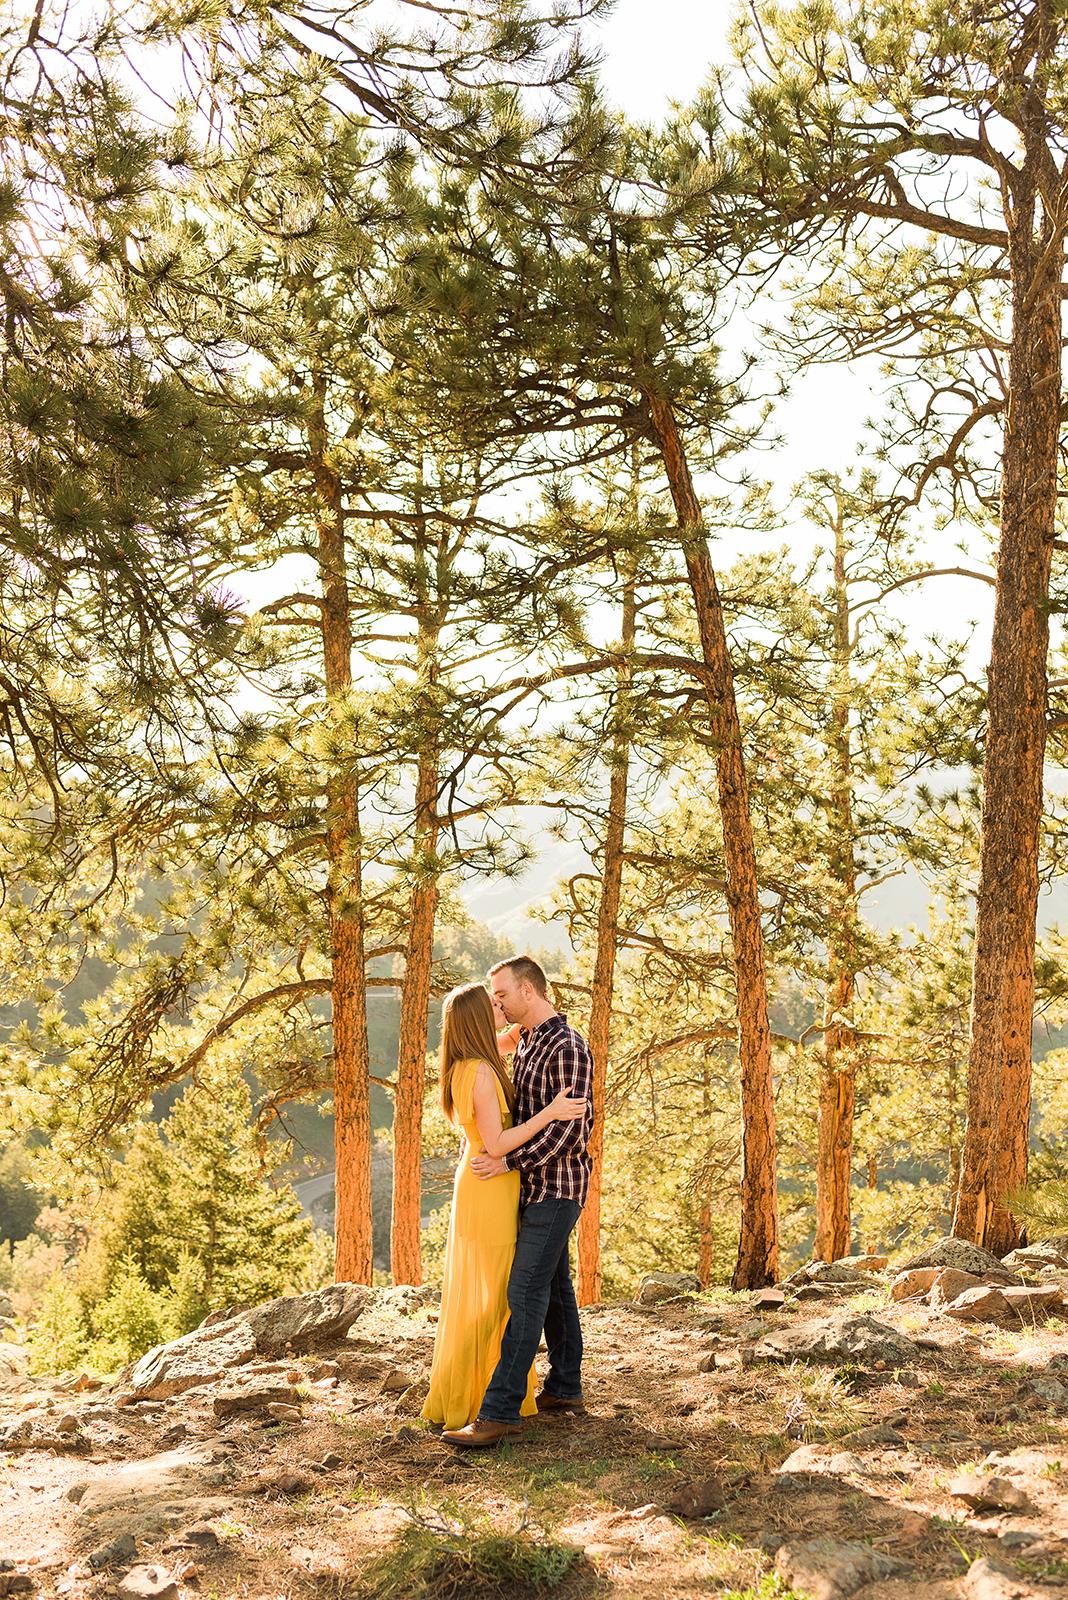 lookout-mountain-engagement-session-denver-engagement-photographer-33.jpg